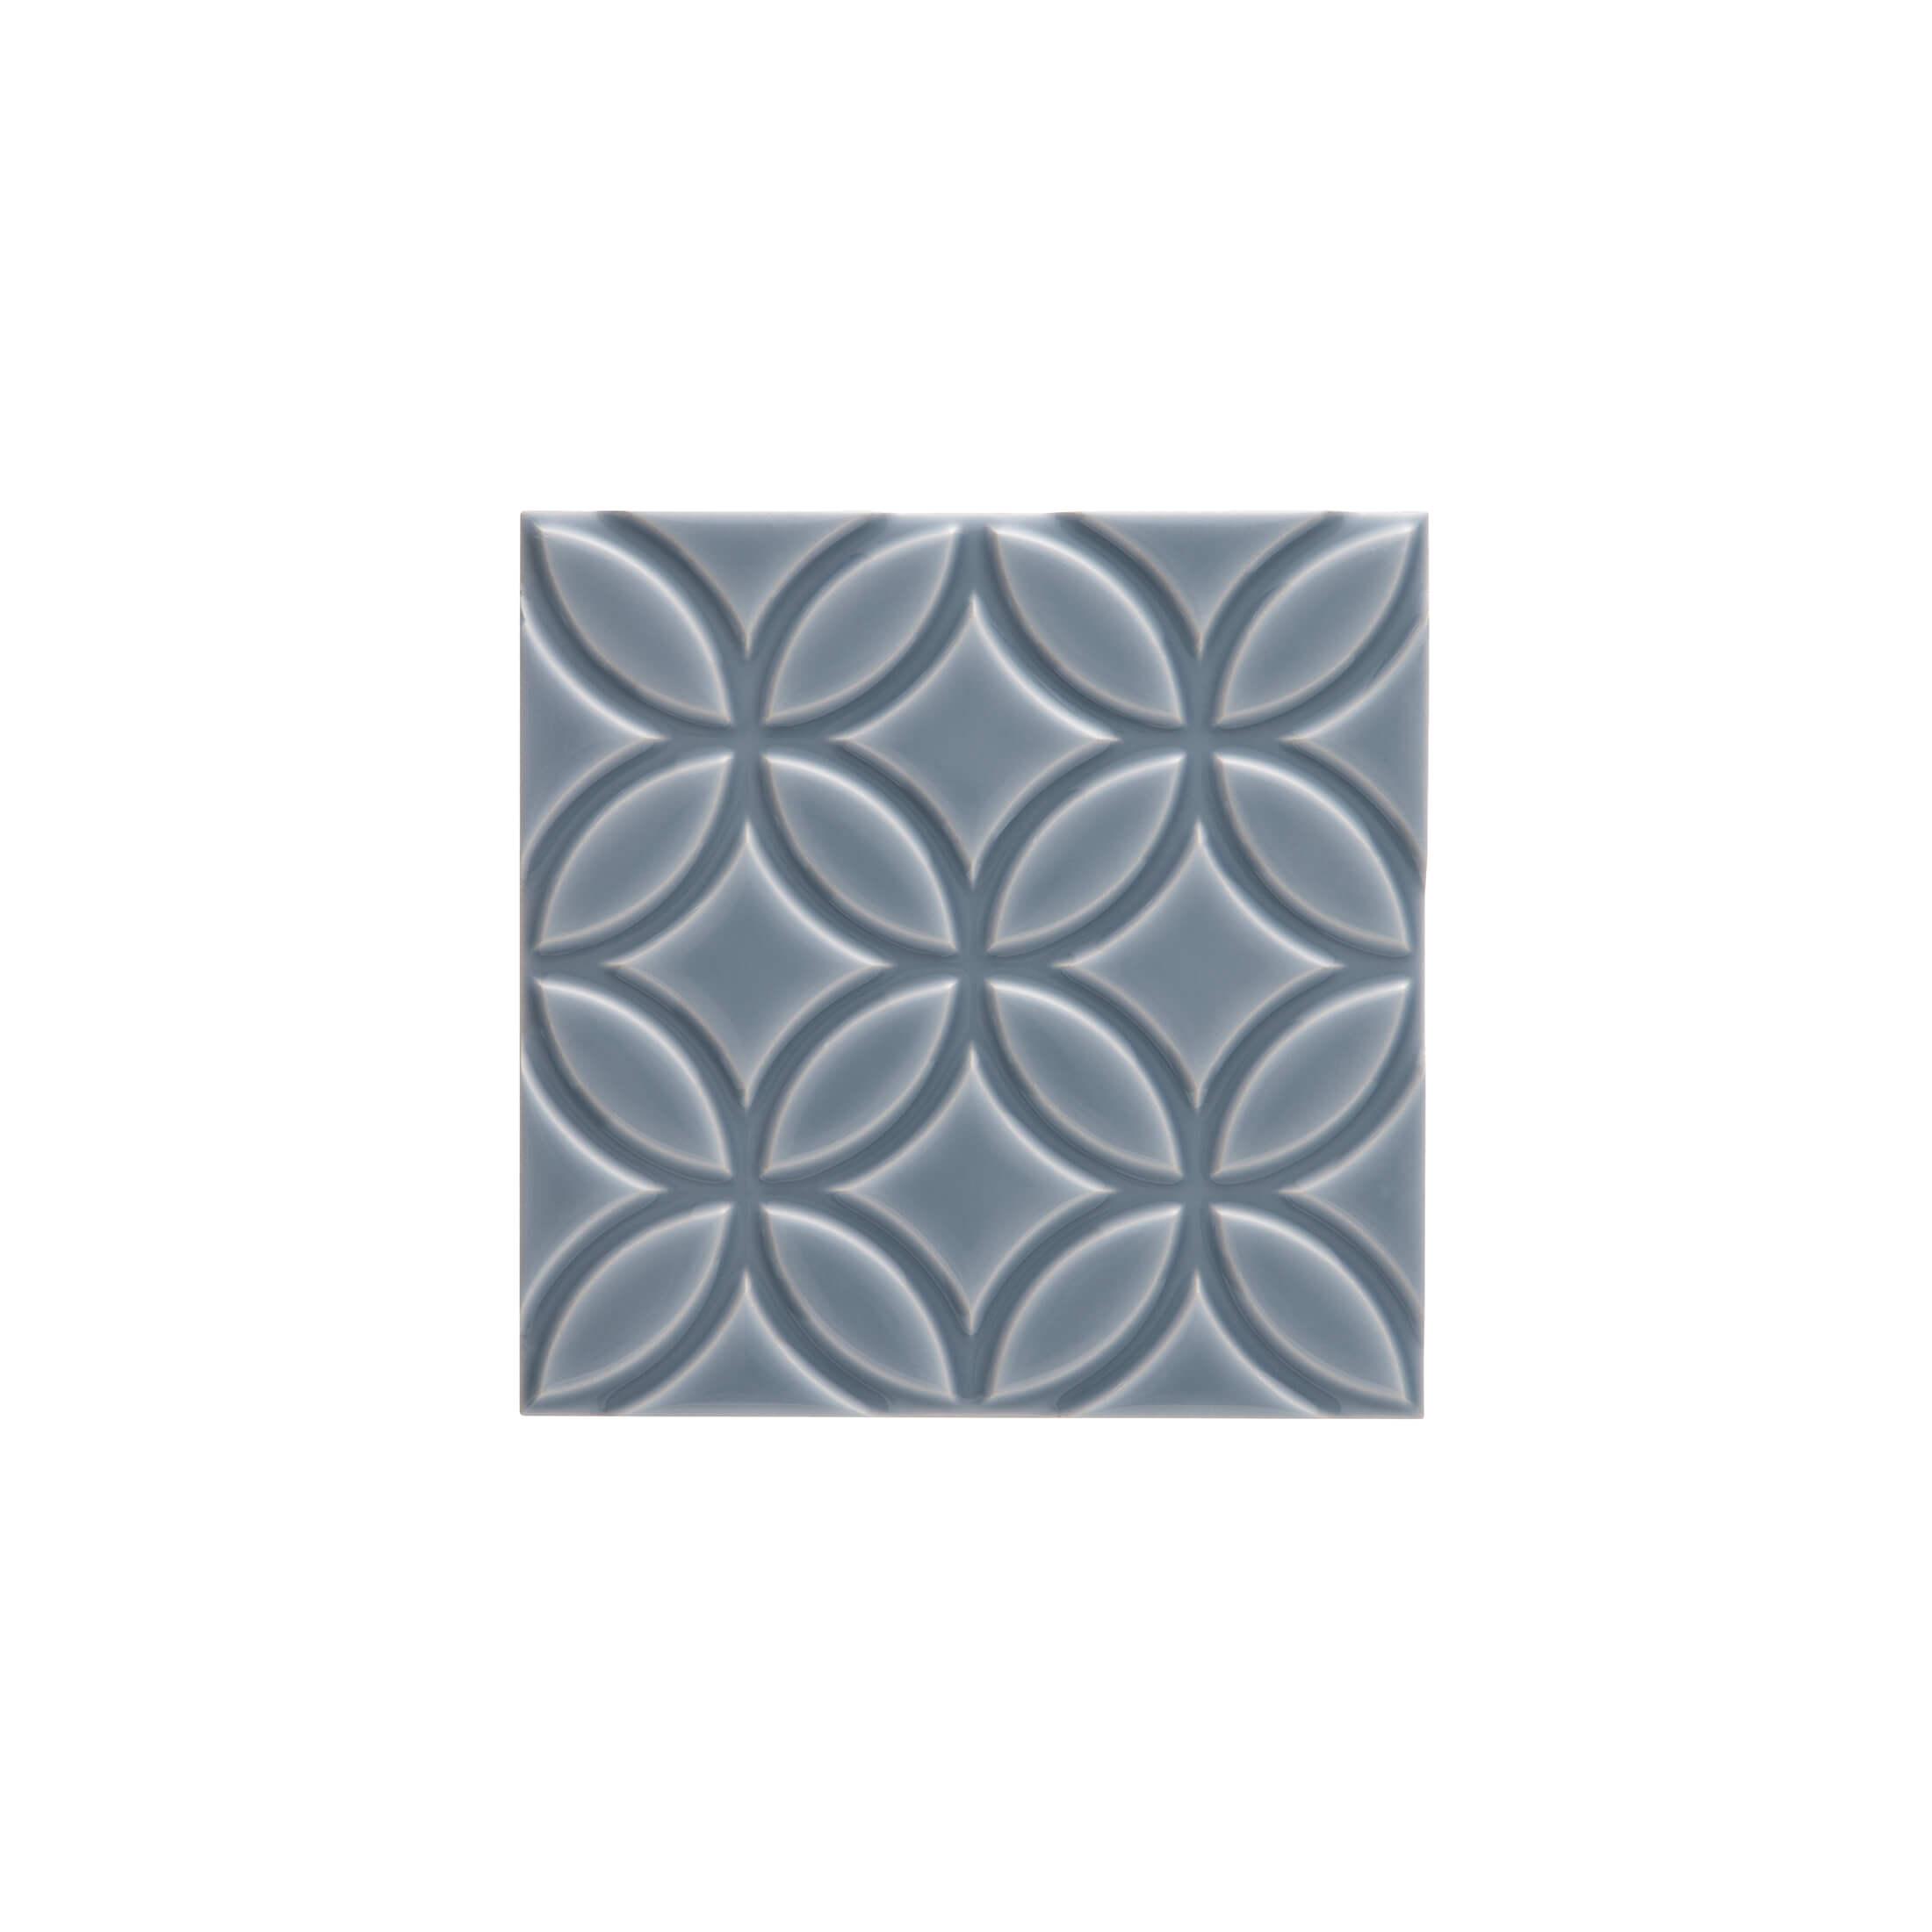 ADEX-ADNE4143-LISO-BOTANICAL  -15 cm-15 cm-NERI>STORM BLUE